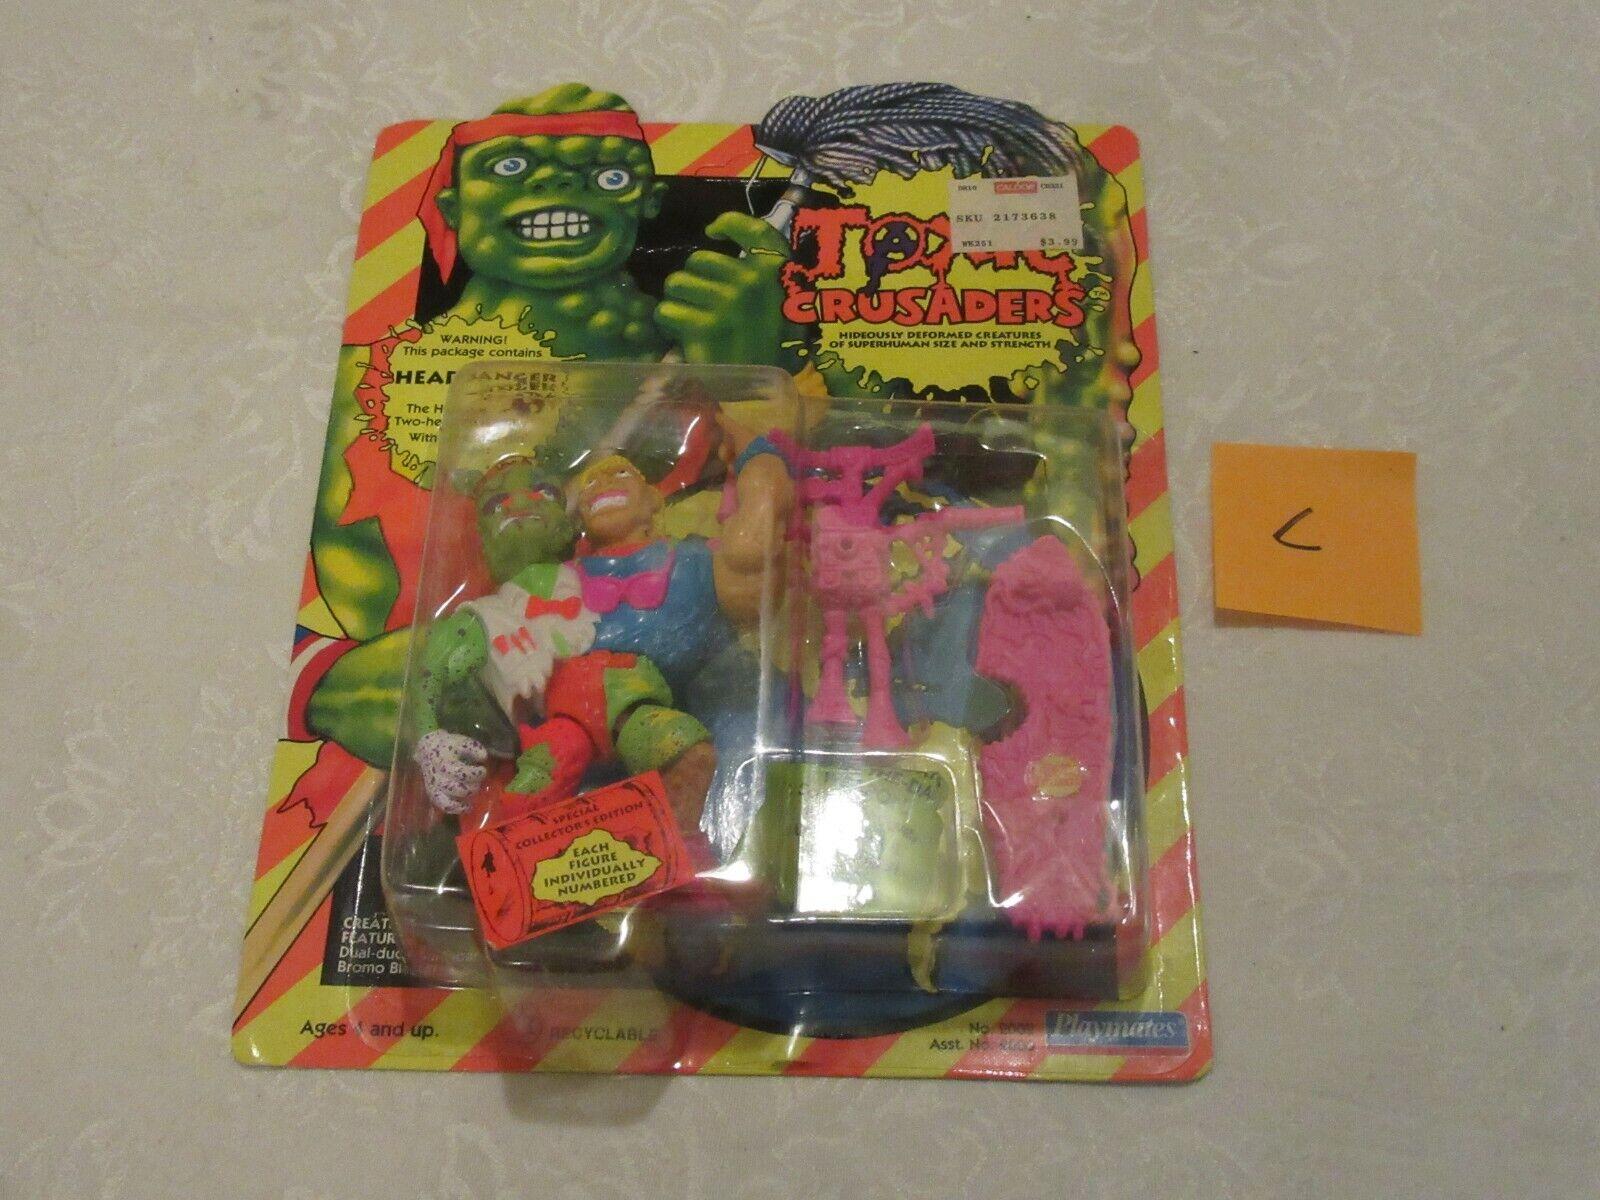 Playmates Toxic  Crusaders Headbanger  2002 1991 Unpunched C azione cifra  economico in alta qualità